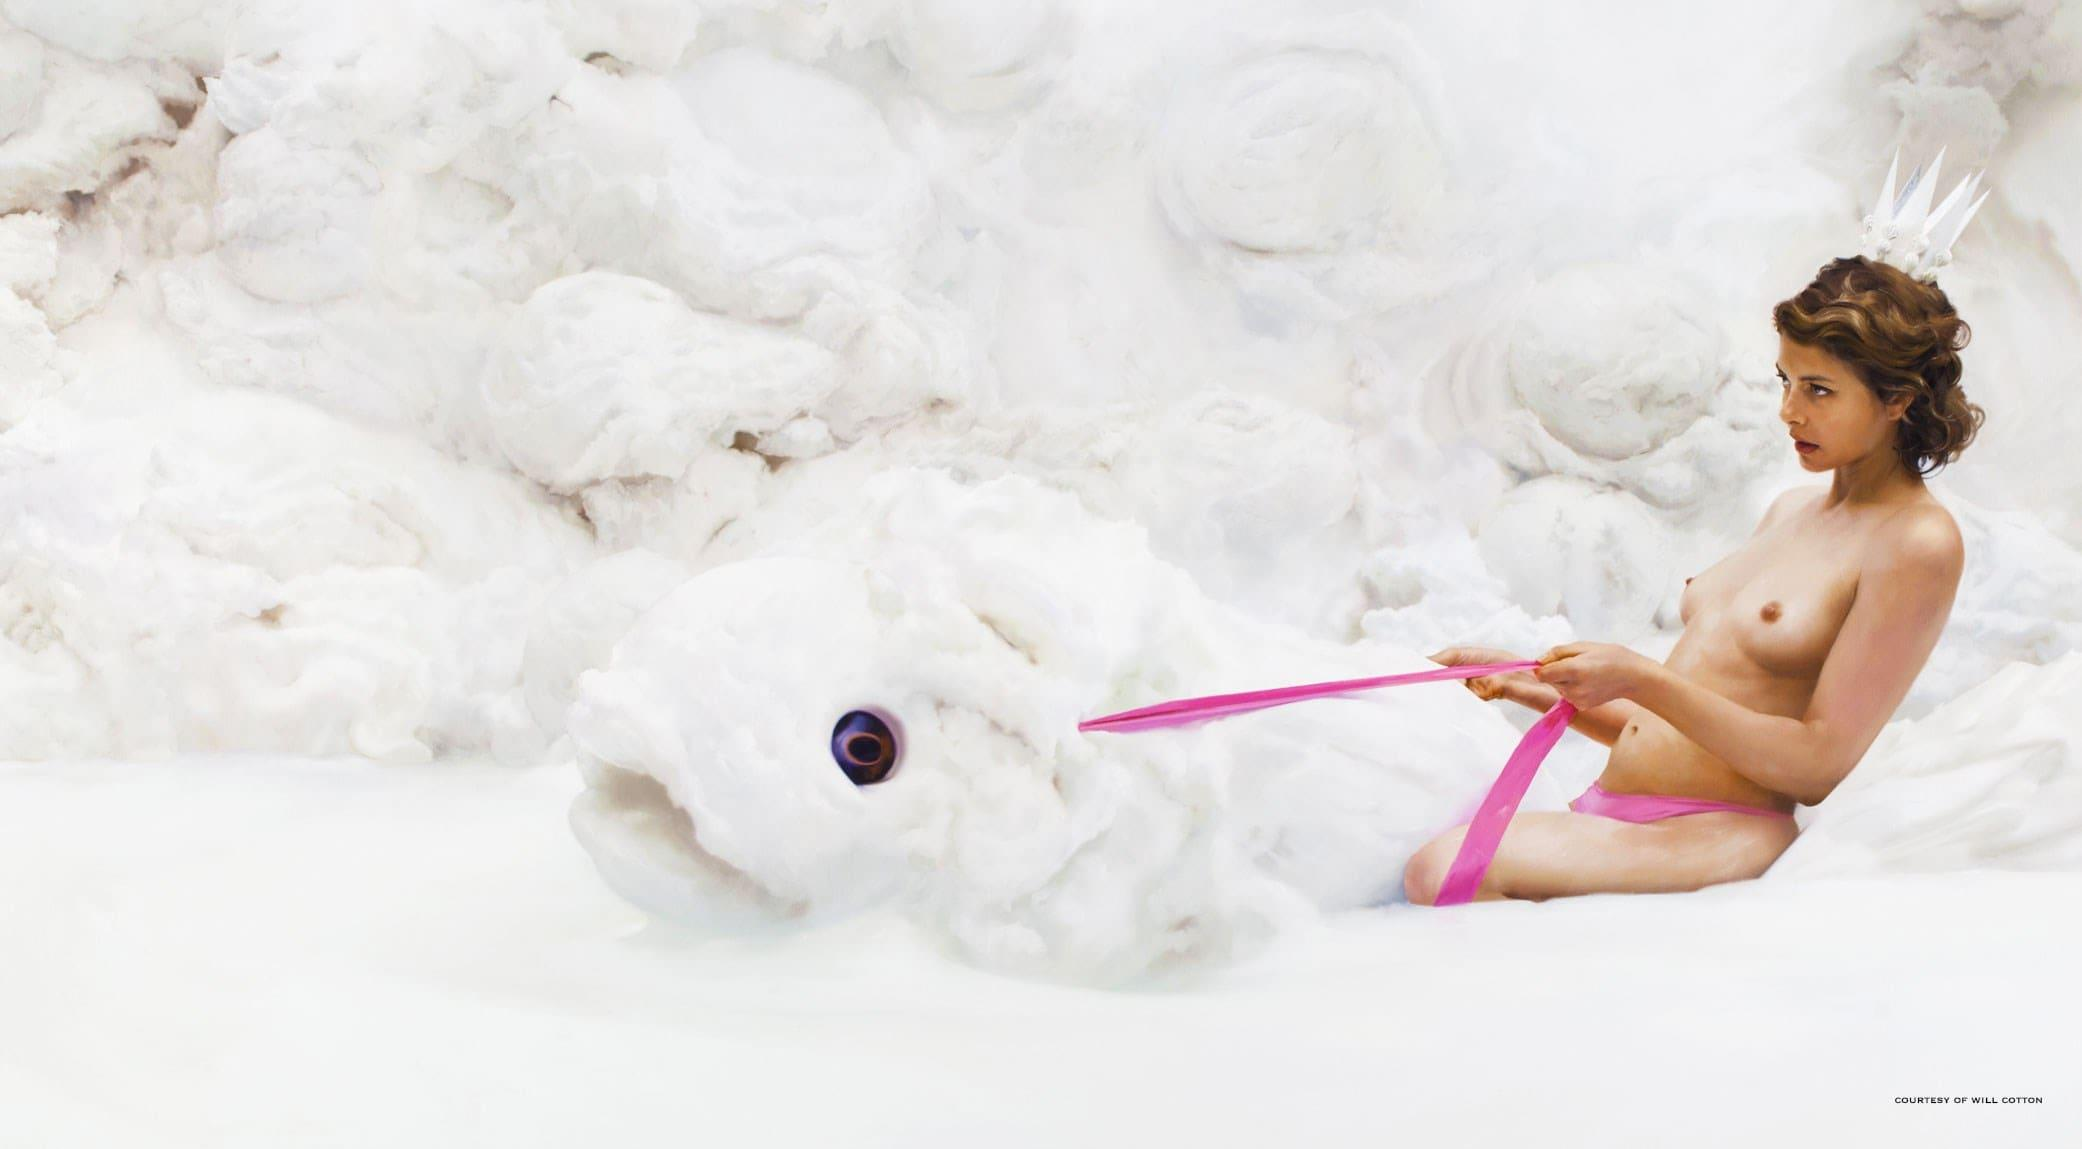 original_will-cotton-fiendininglovers-006.jpg